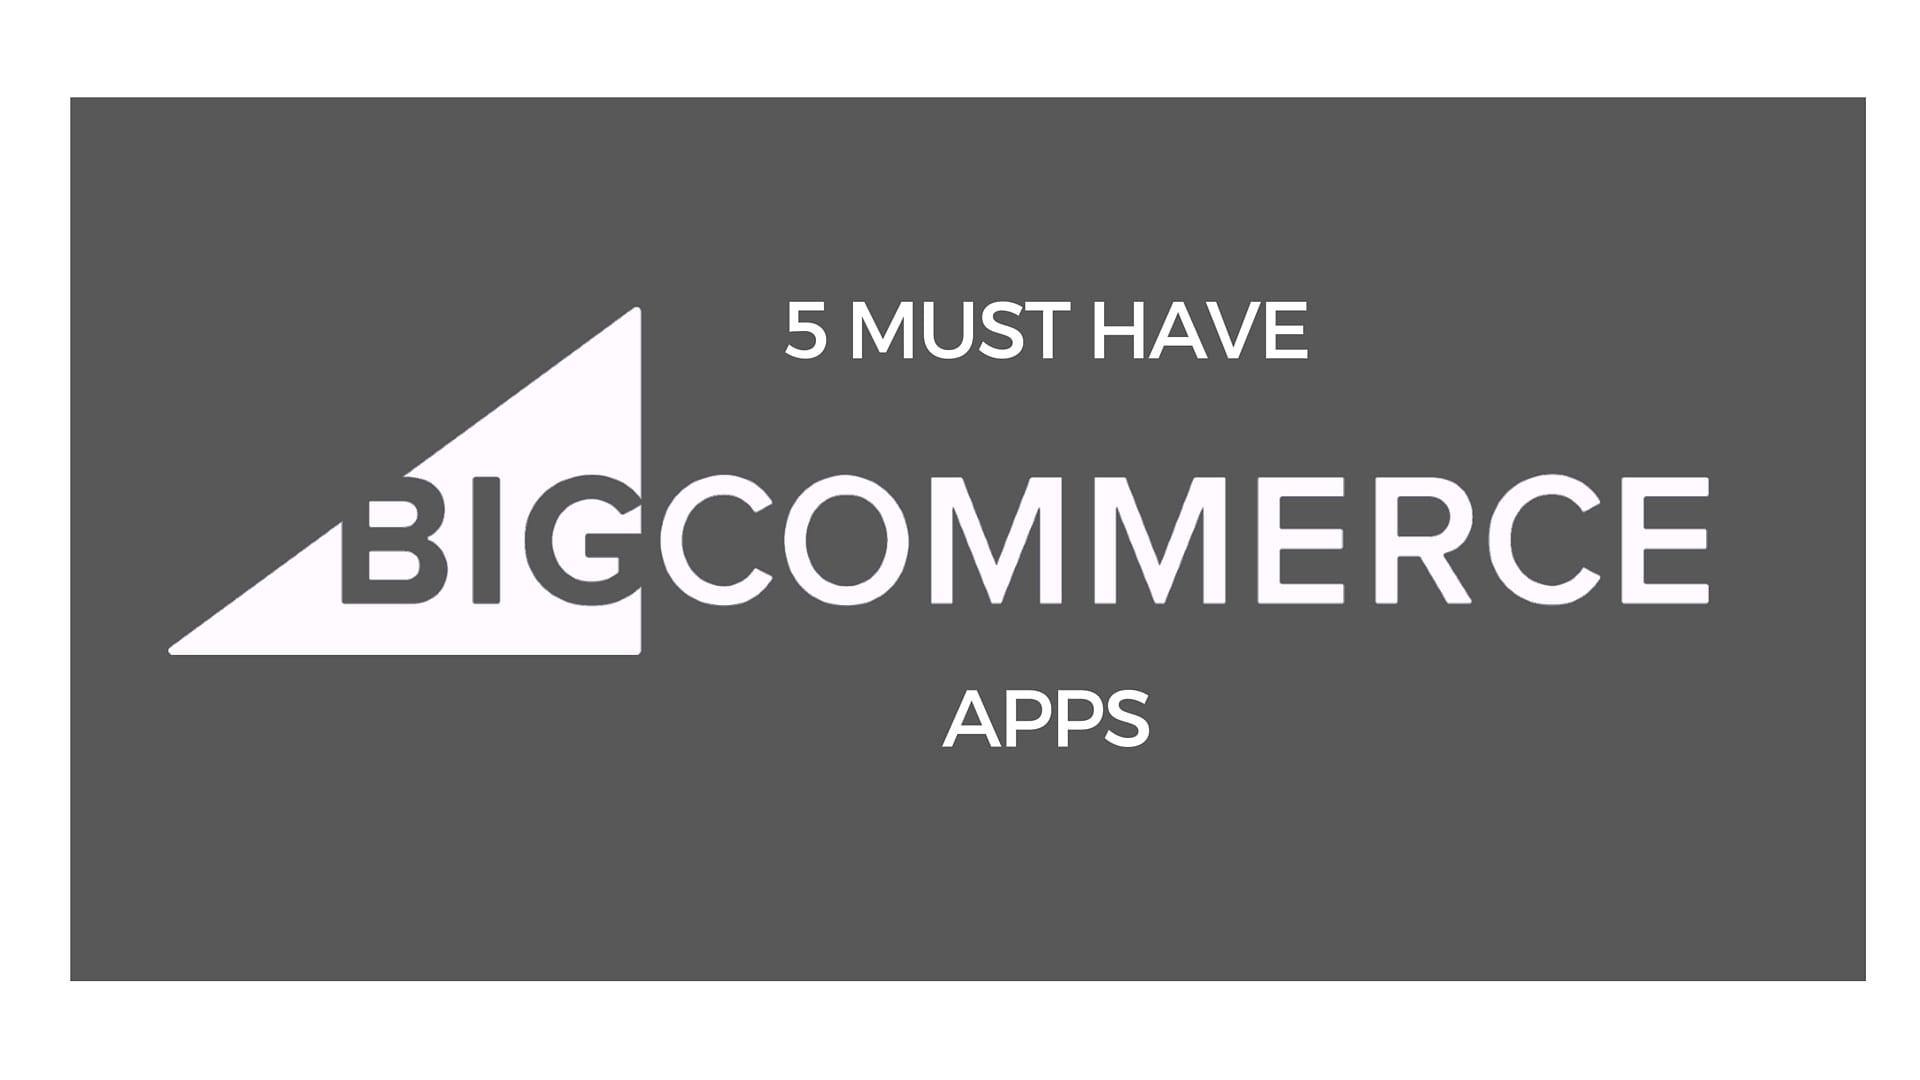 Must Have BigCommerce Apps header image